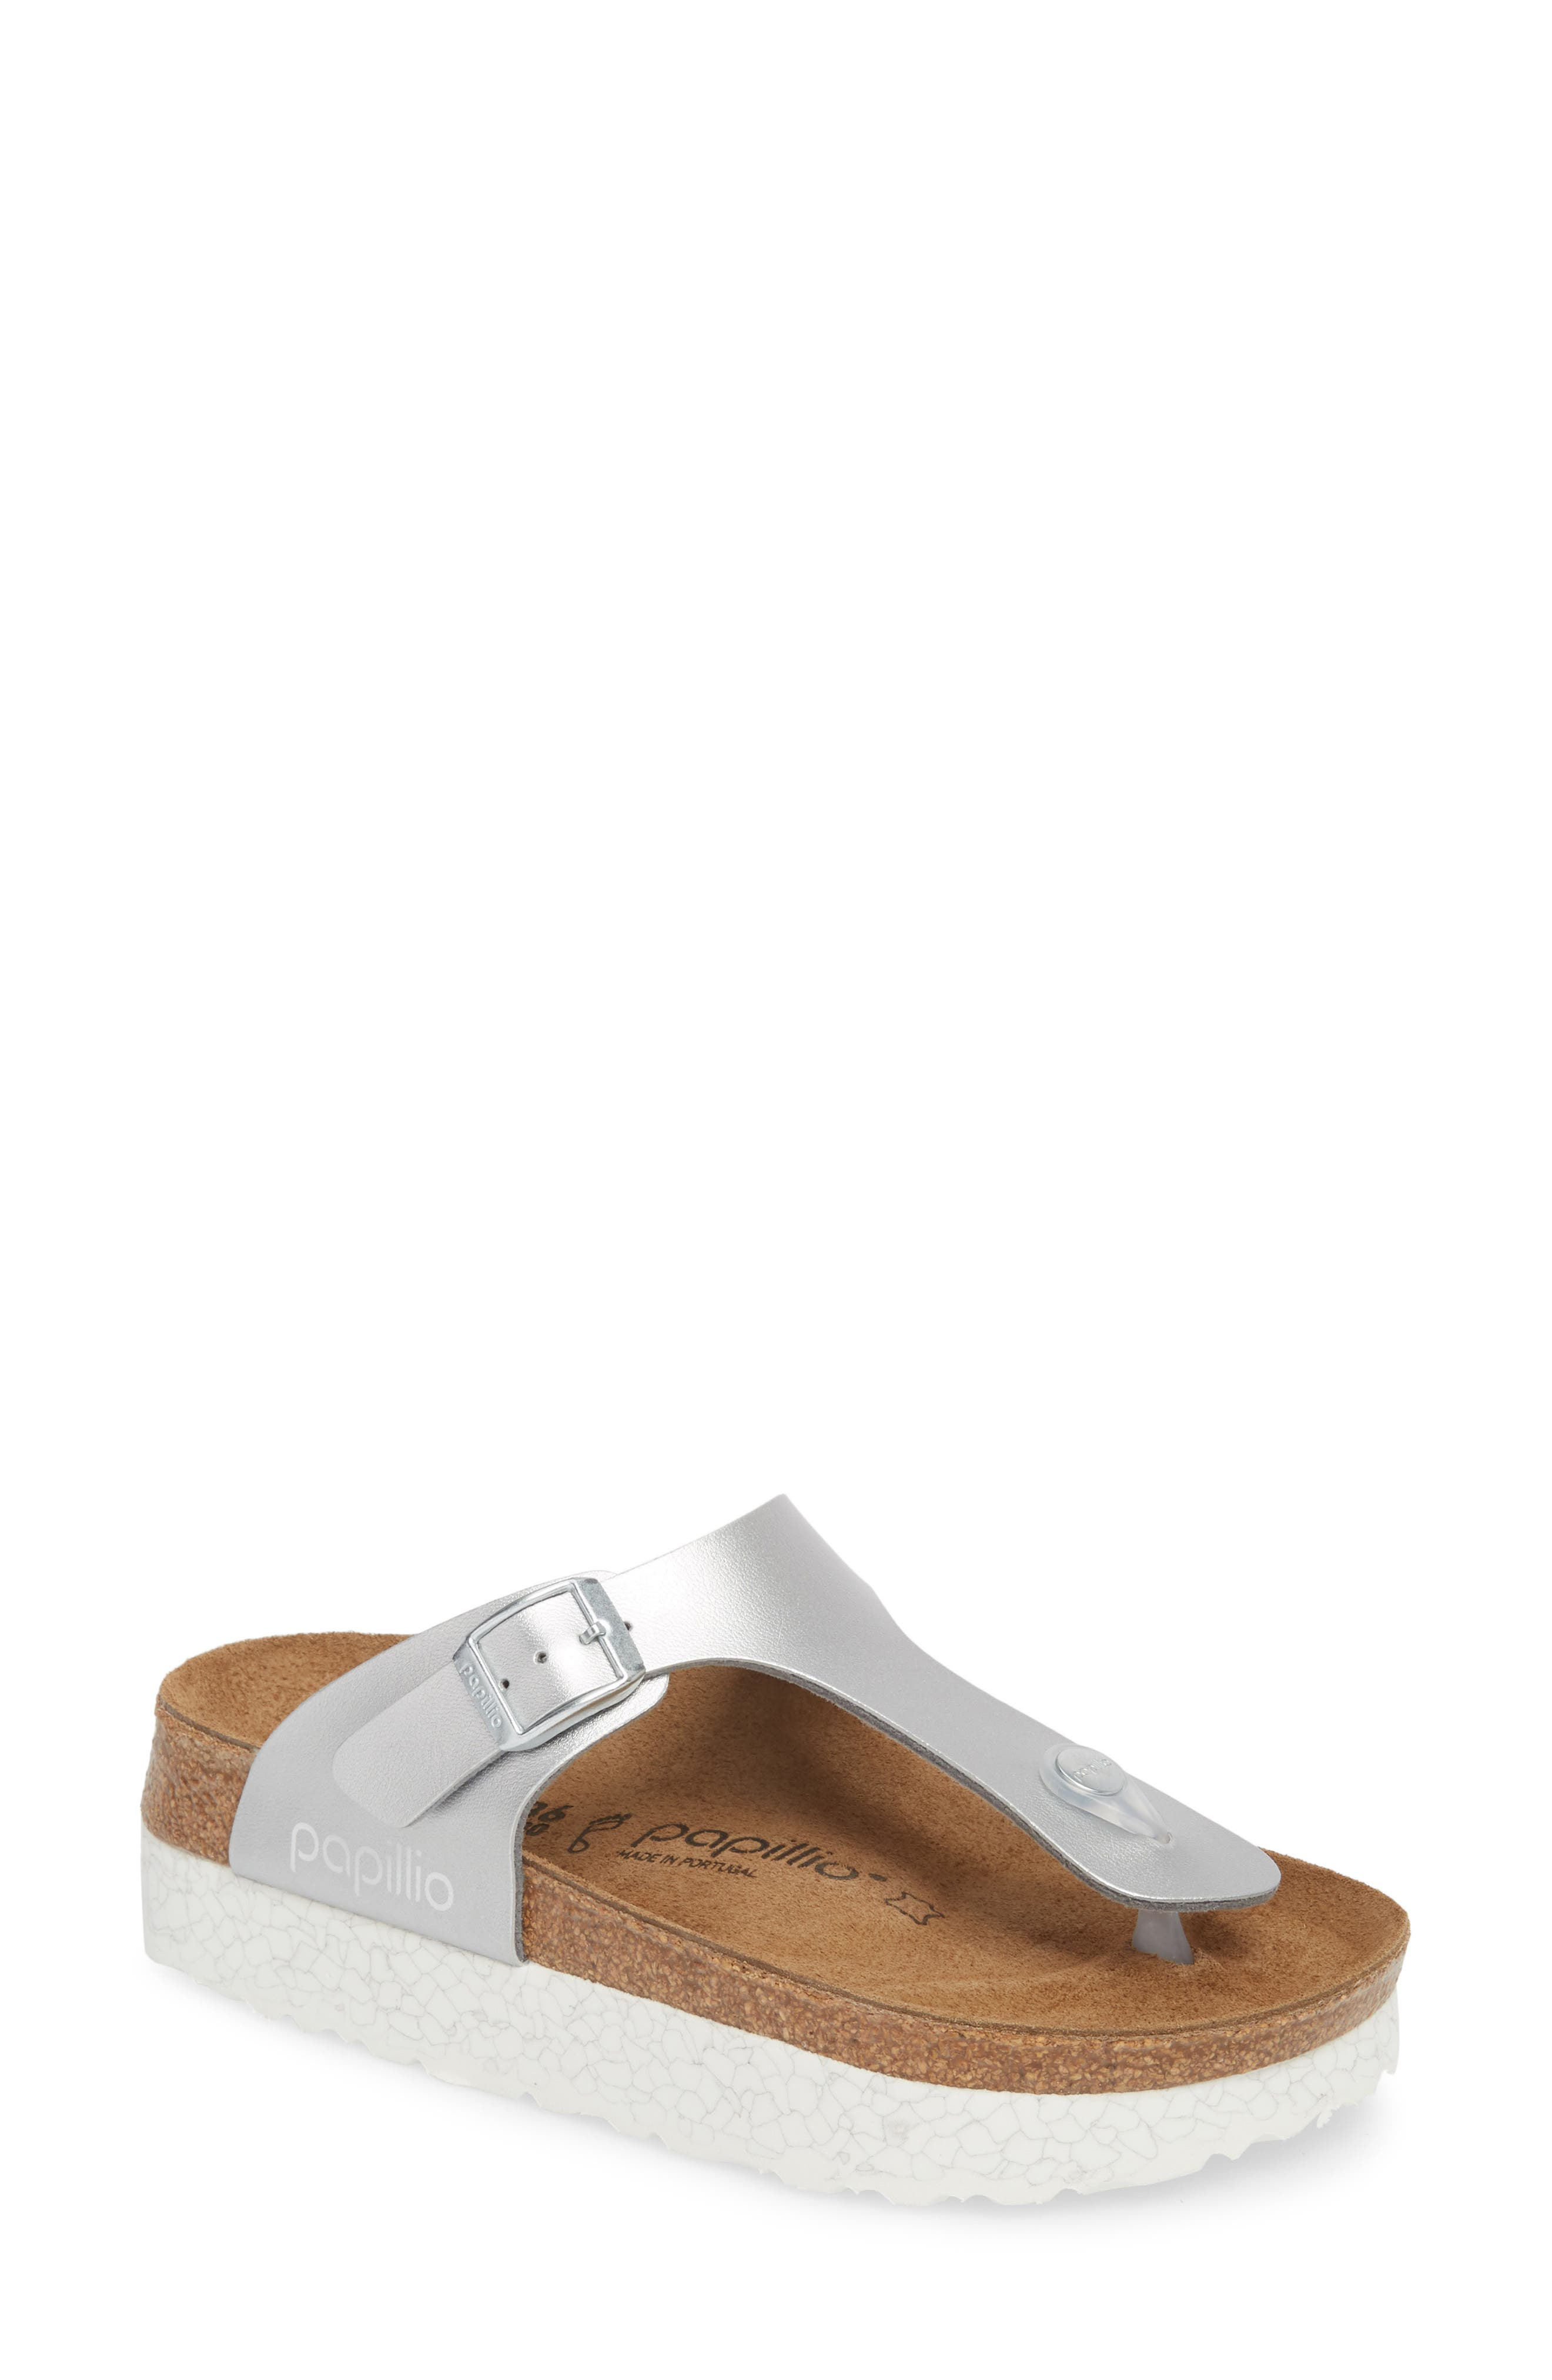 Papillio by Birkenstock 'Gizeh' Birko-Flor Platform Flip Flop Sandal (Women)